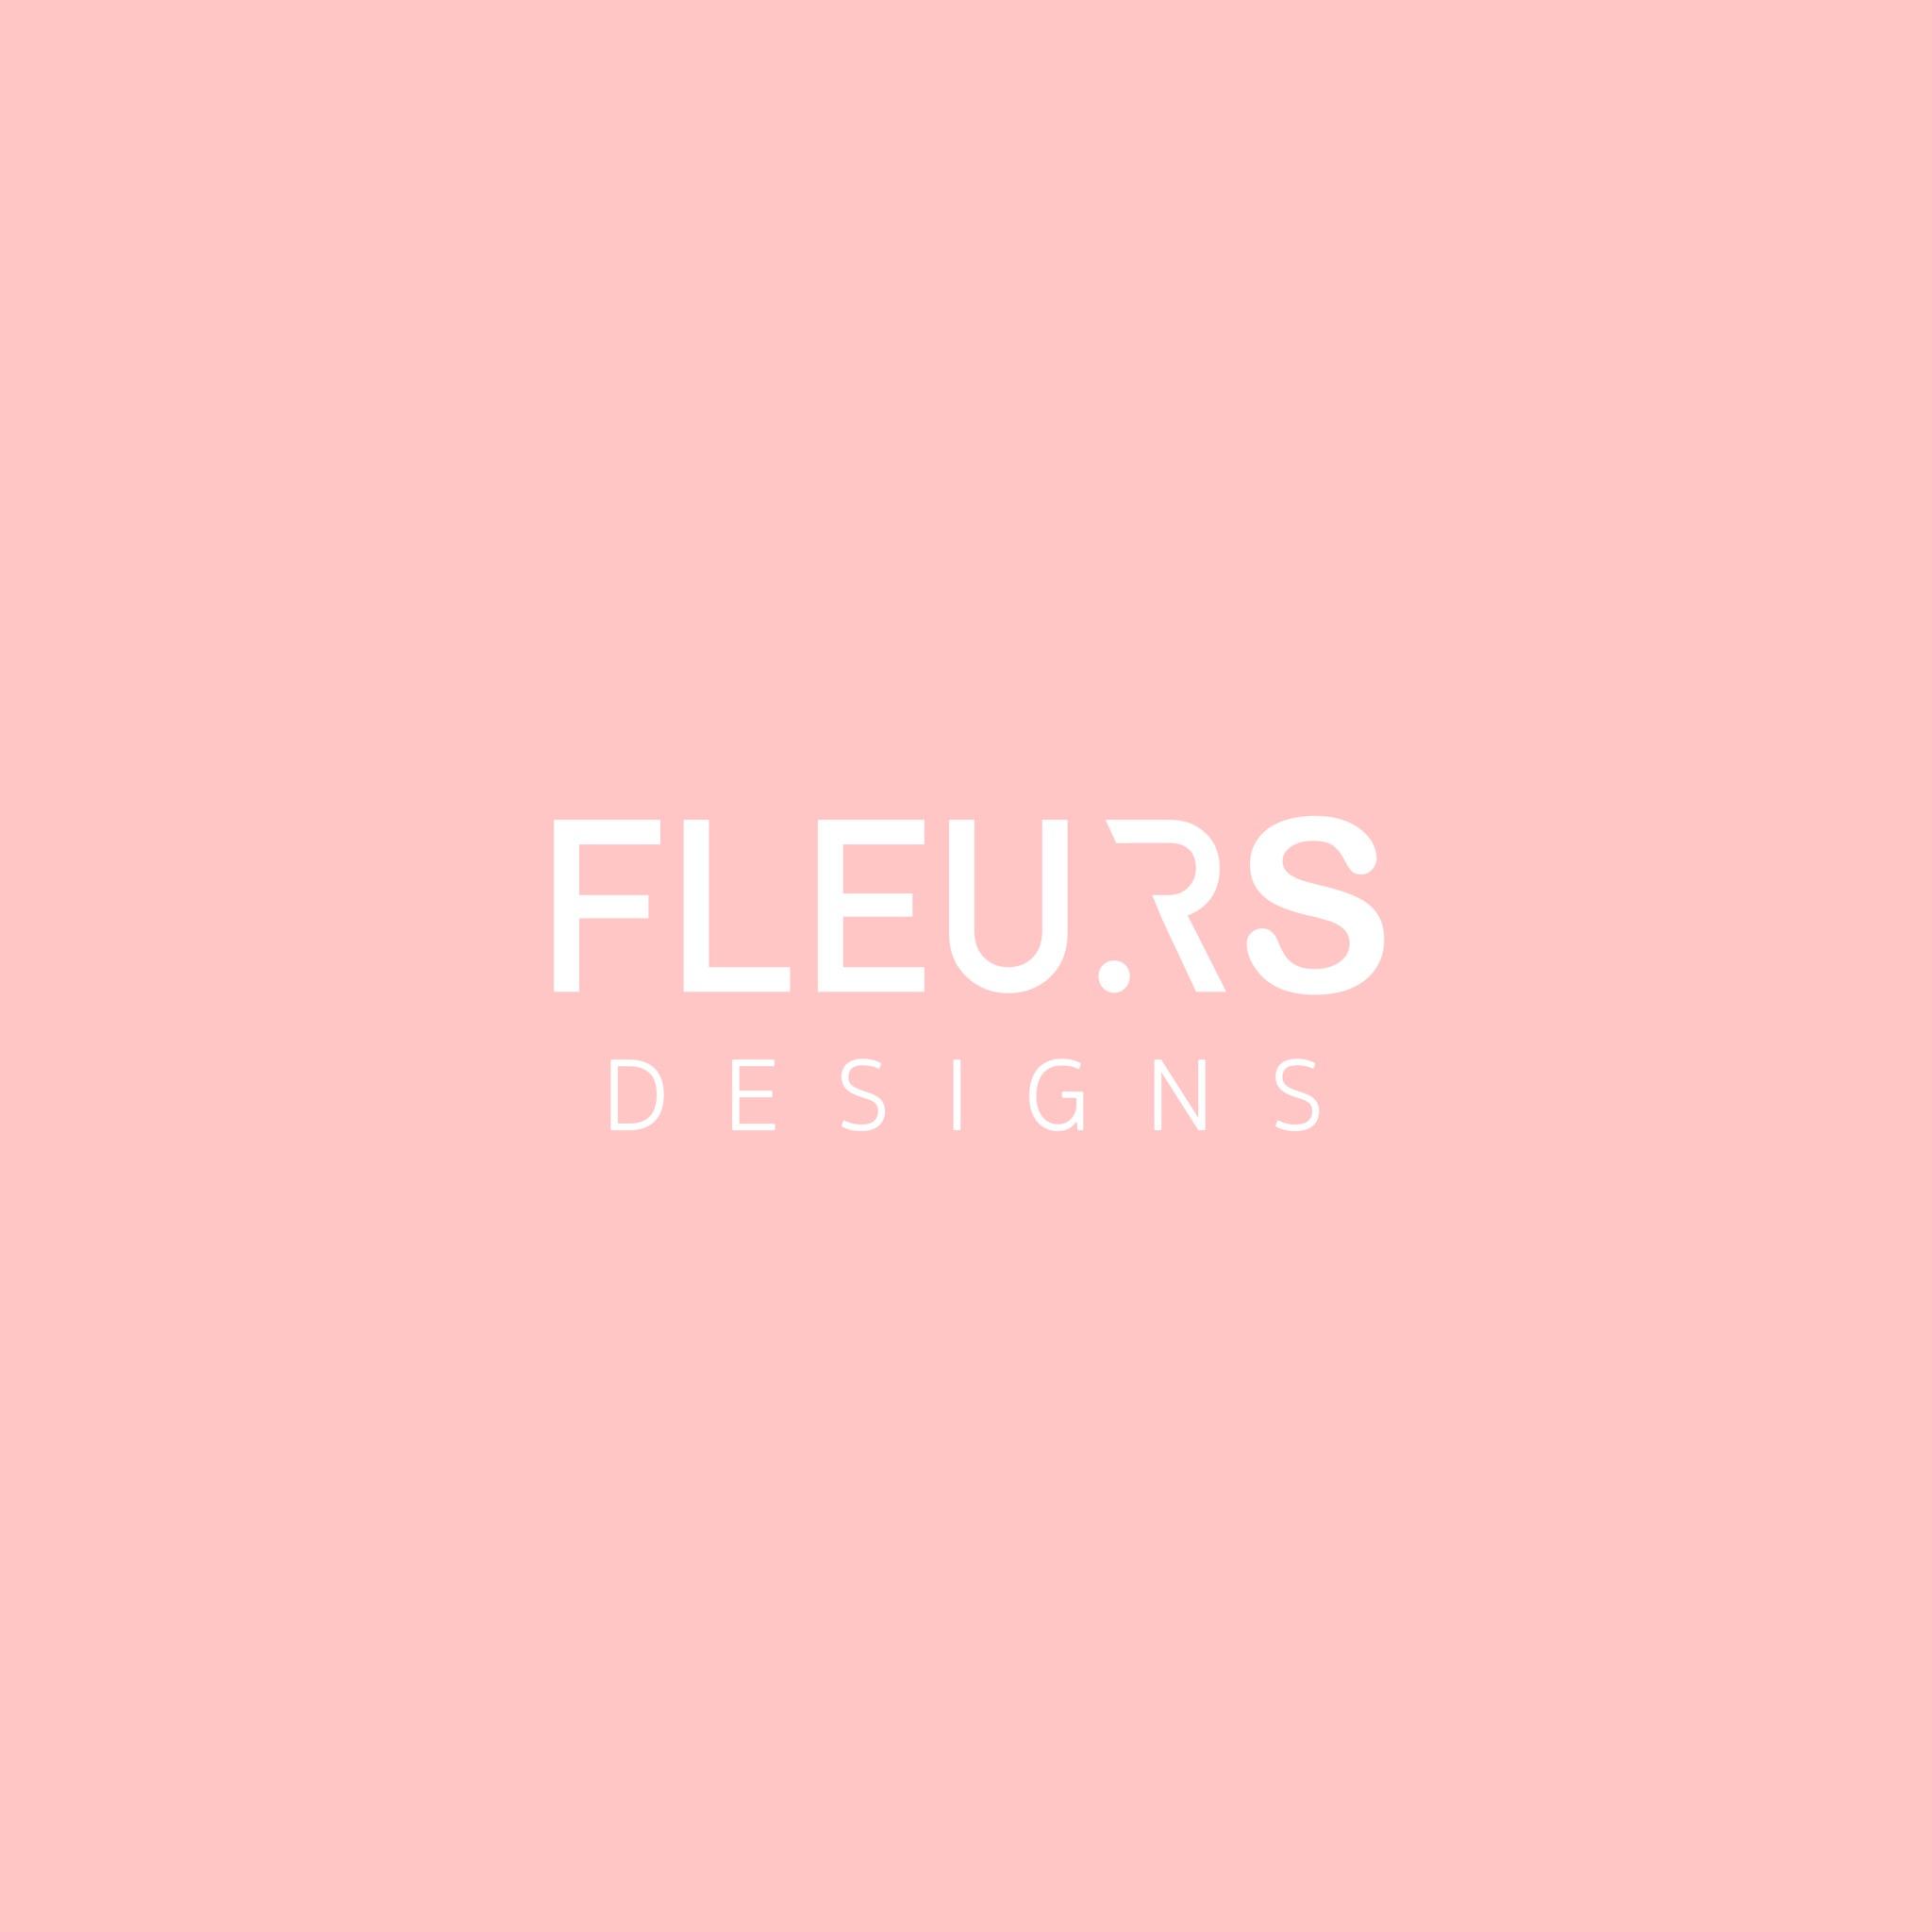 Fleurs designs